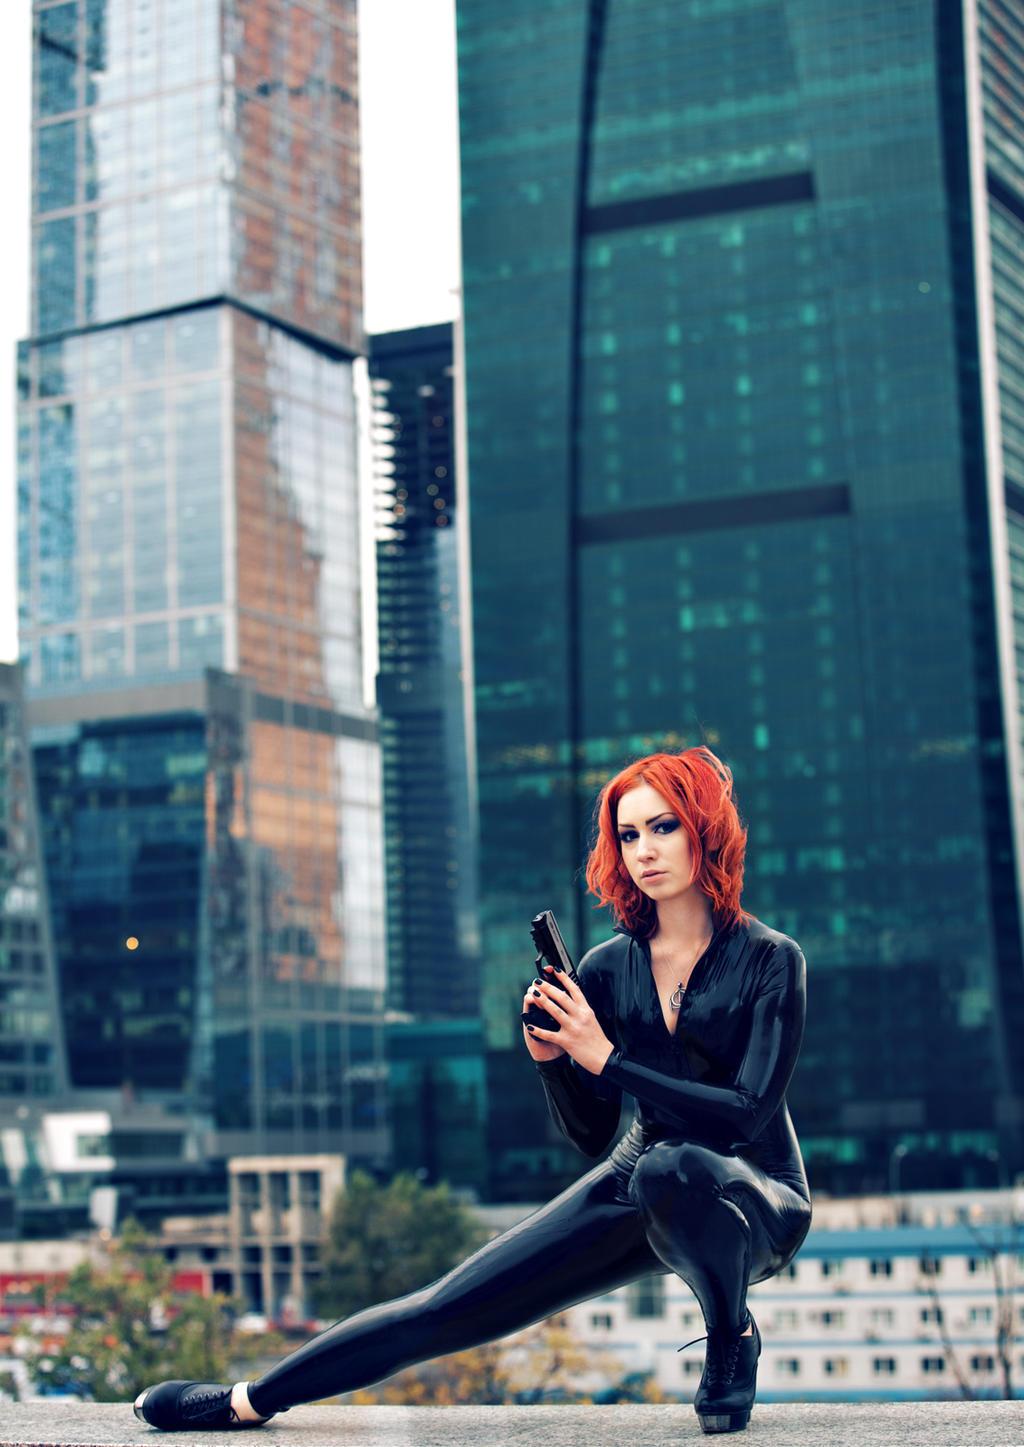 Black widow 5 by Agcooper73 on DeviantArt